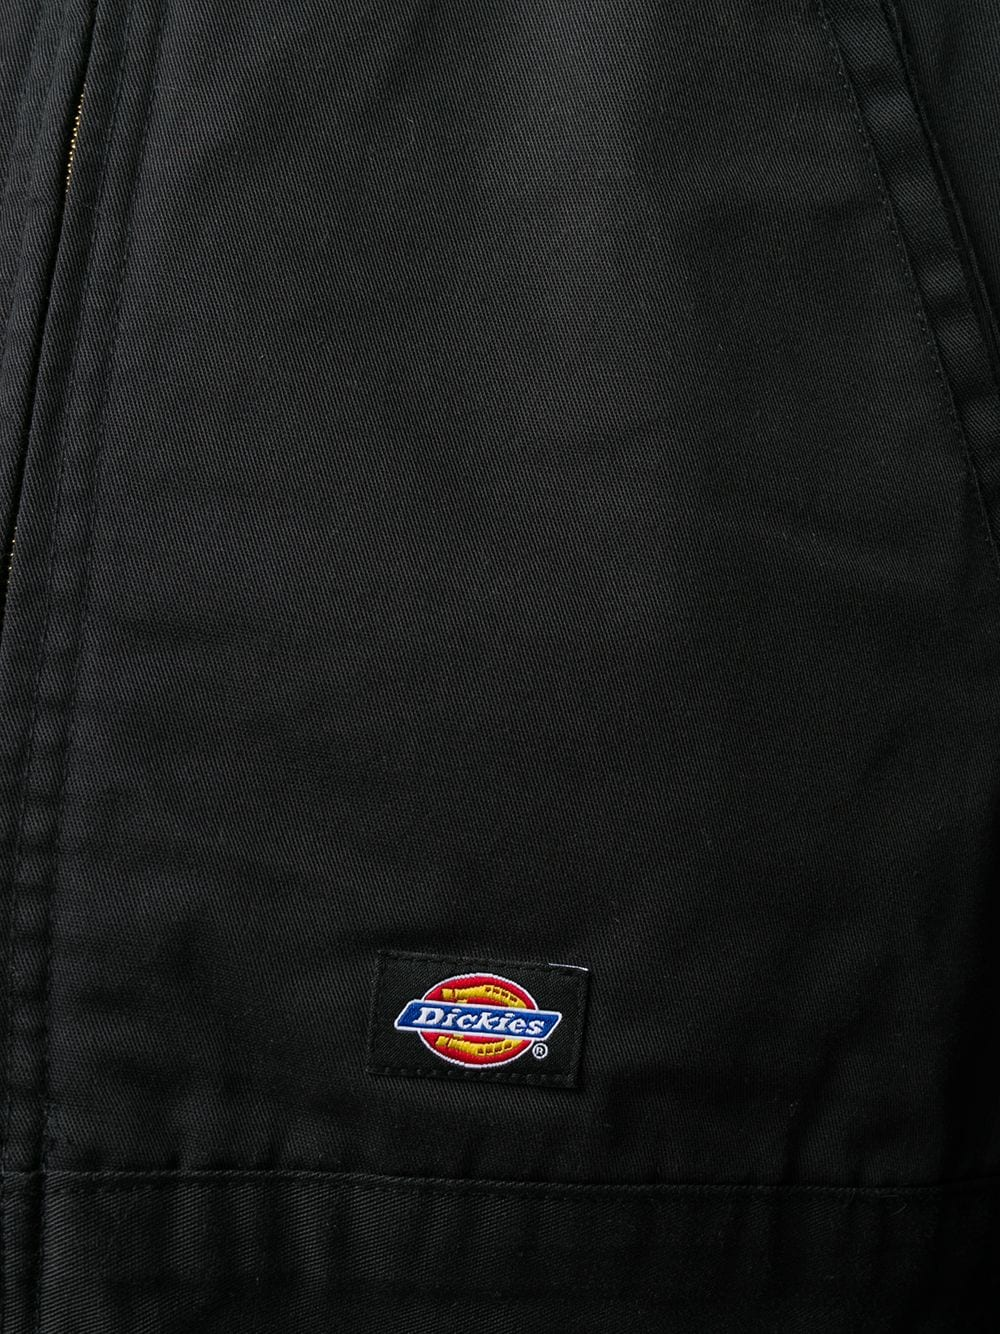 giacca camicia uomo nera DICKIES | Giacche | DK00TJ15BLK1